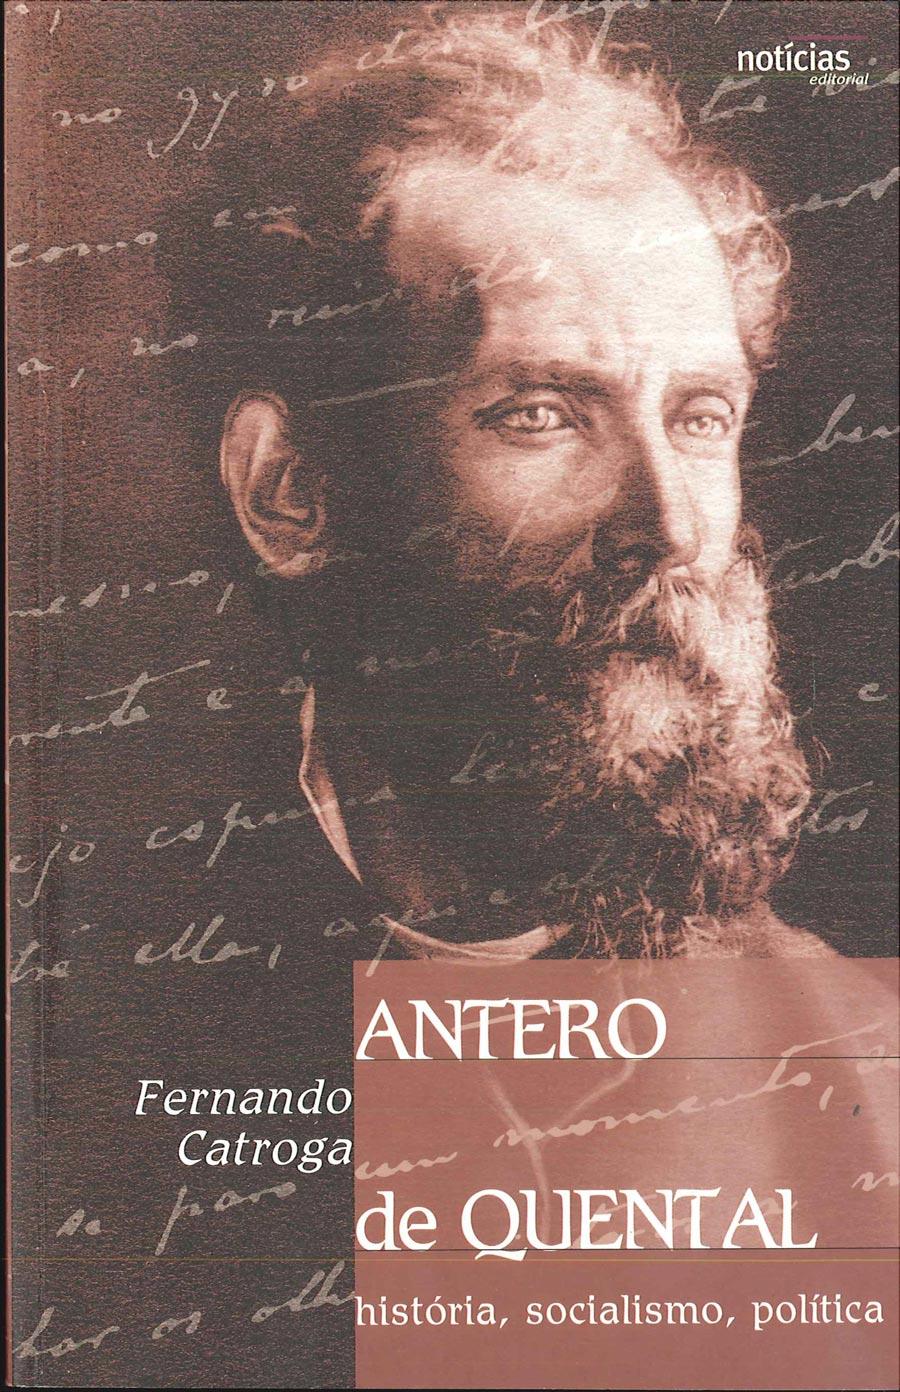 Antero-de-Quental--História-Socialismo-Política-1